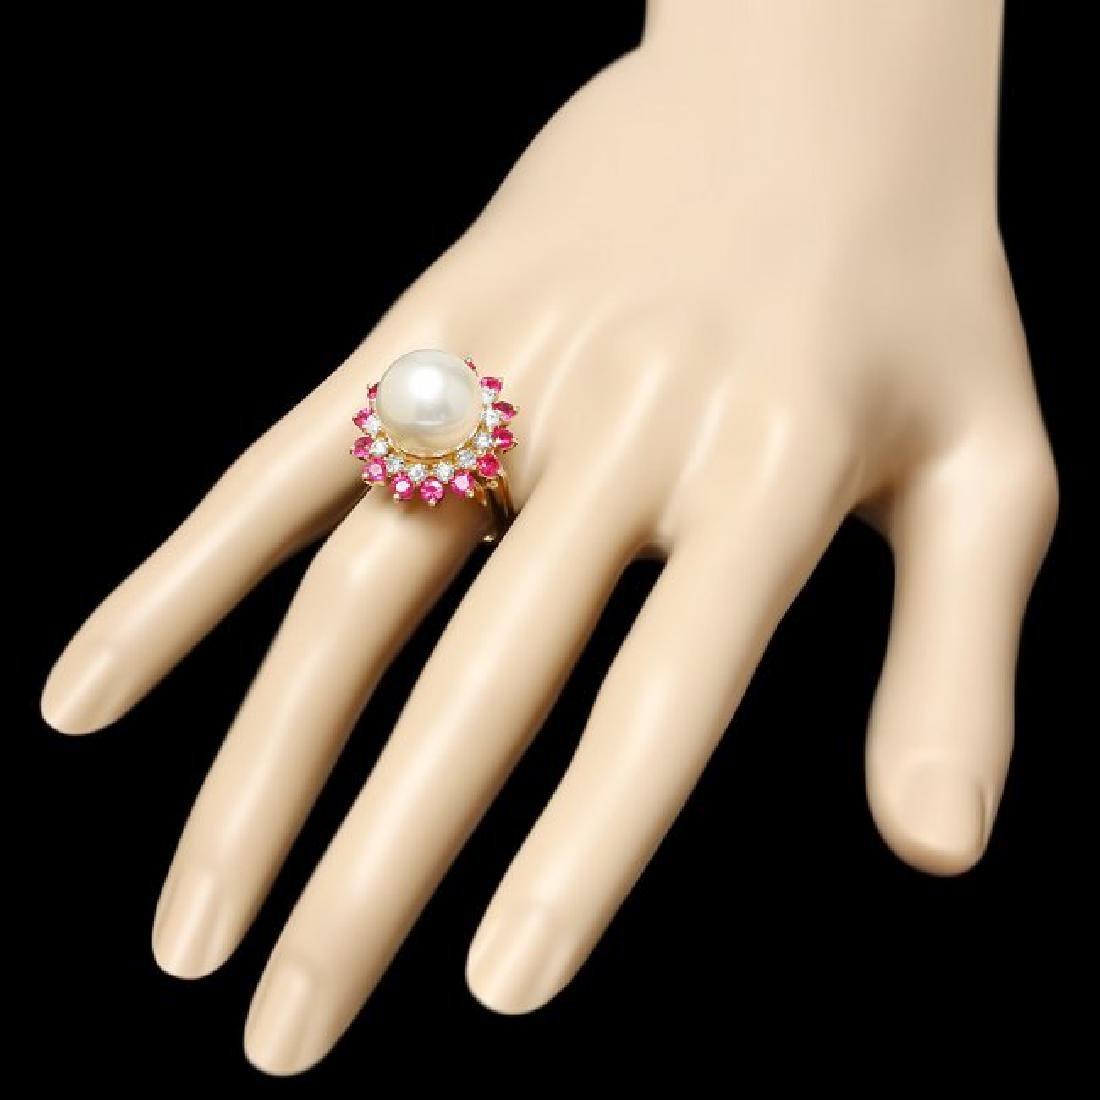 14k Gold 13 X 13mm Pearl 0.80ct Diamond Ring - 3